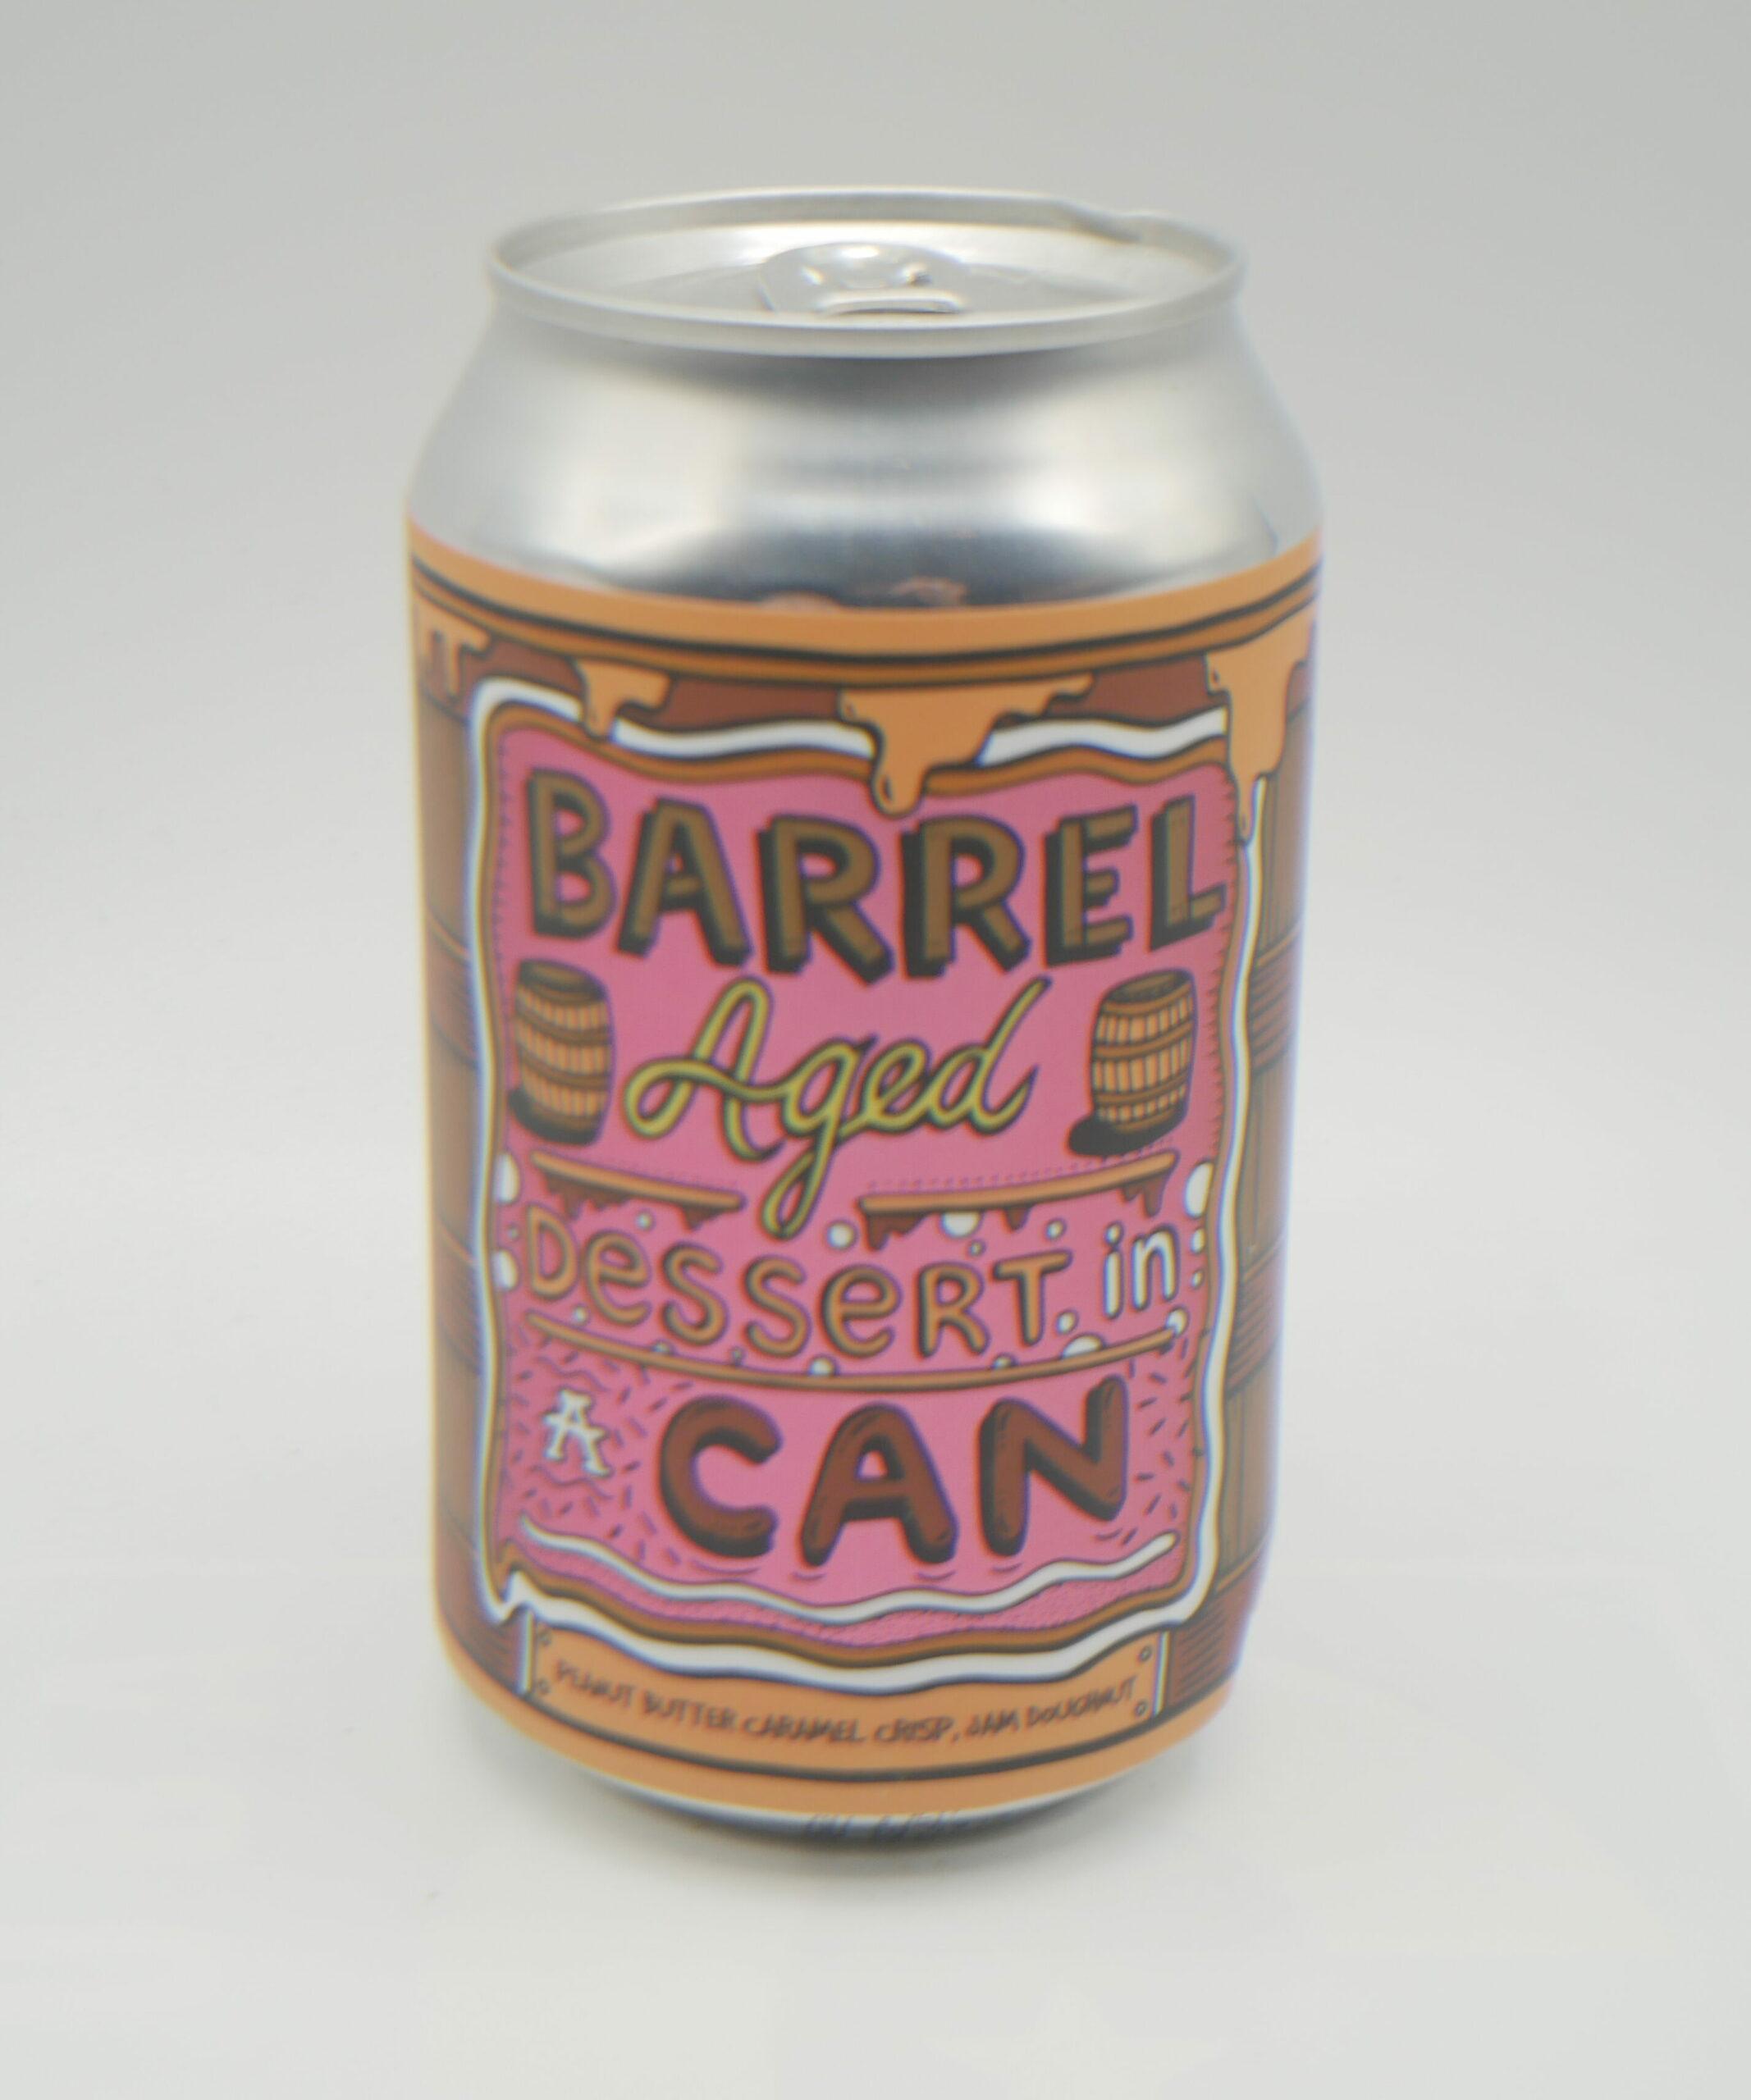 Image Barrel aged dessert in a can peanut butter caramel crisp jam doughnut